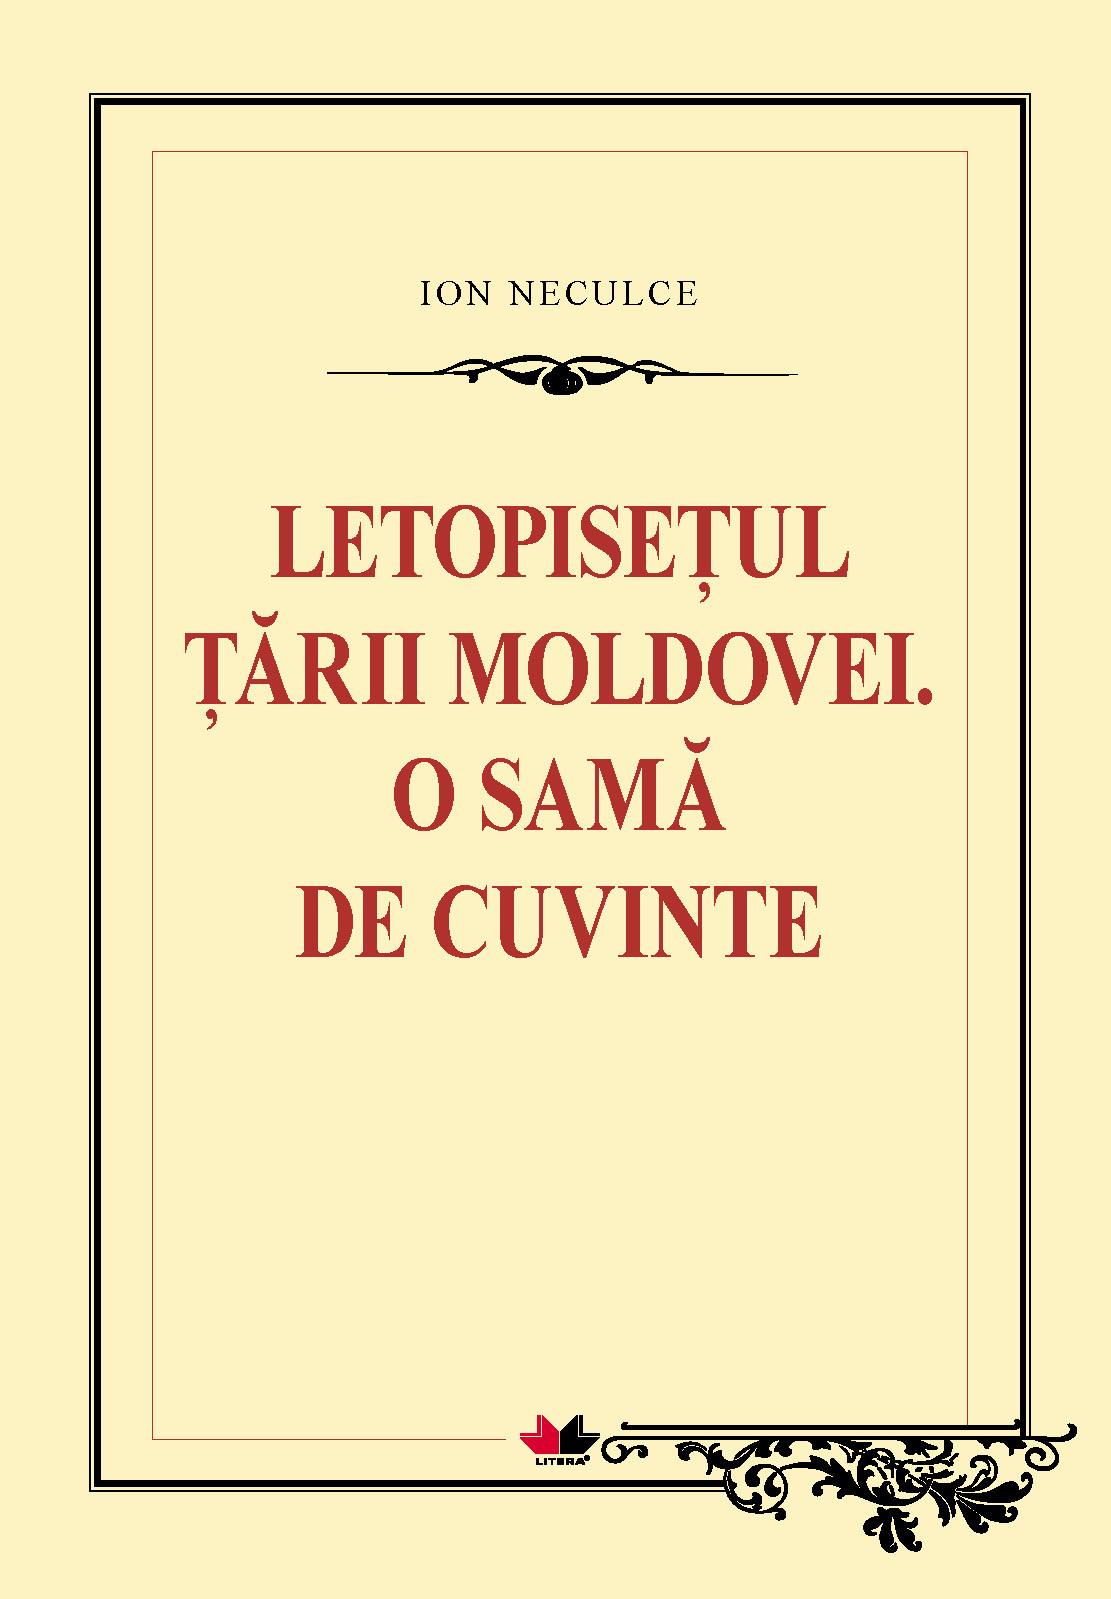 Letopisetul tarii moldovei de ion neculce online dating